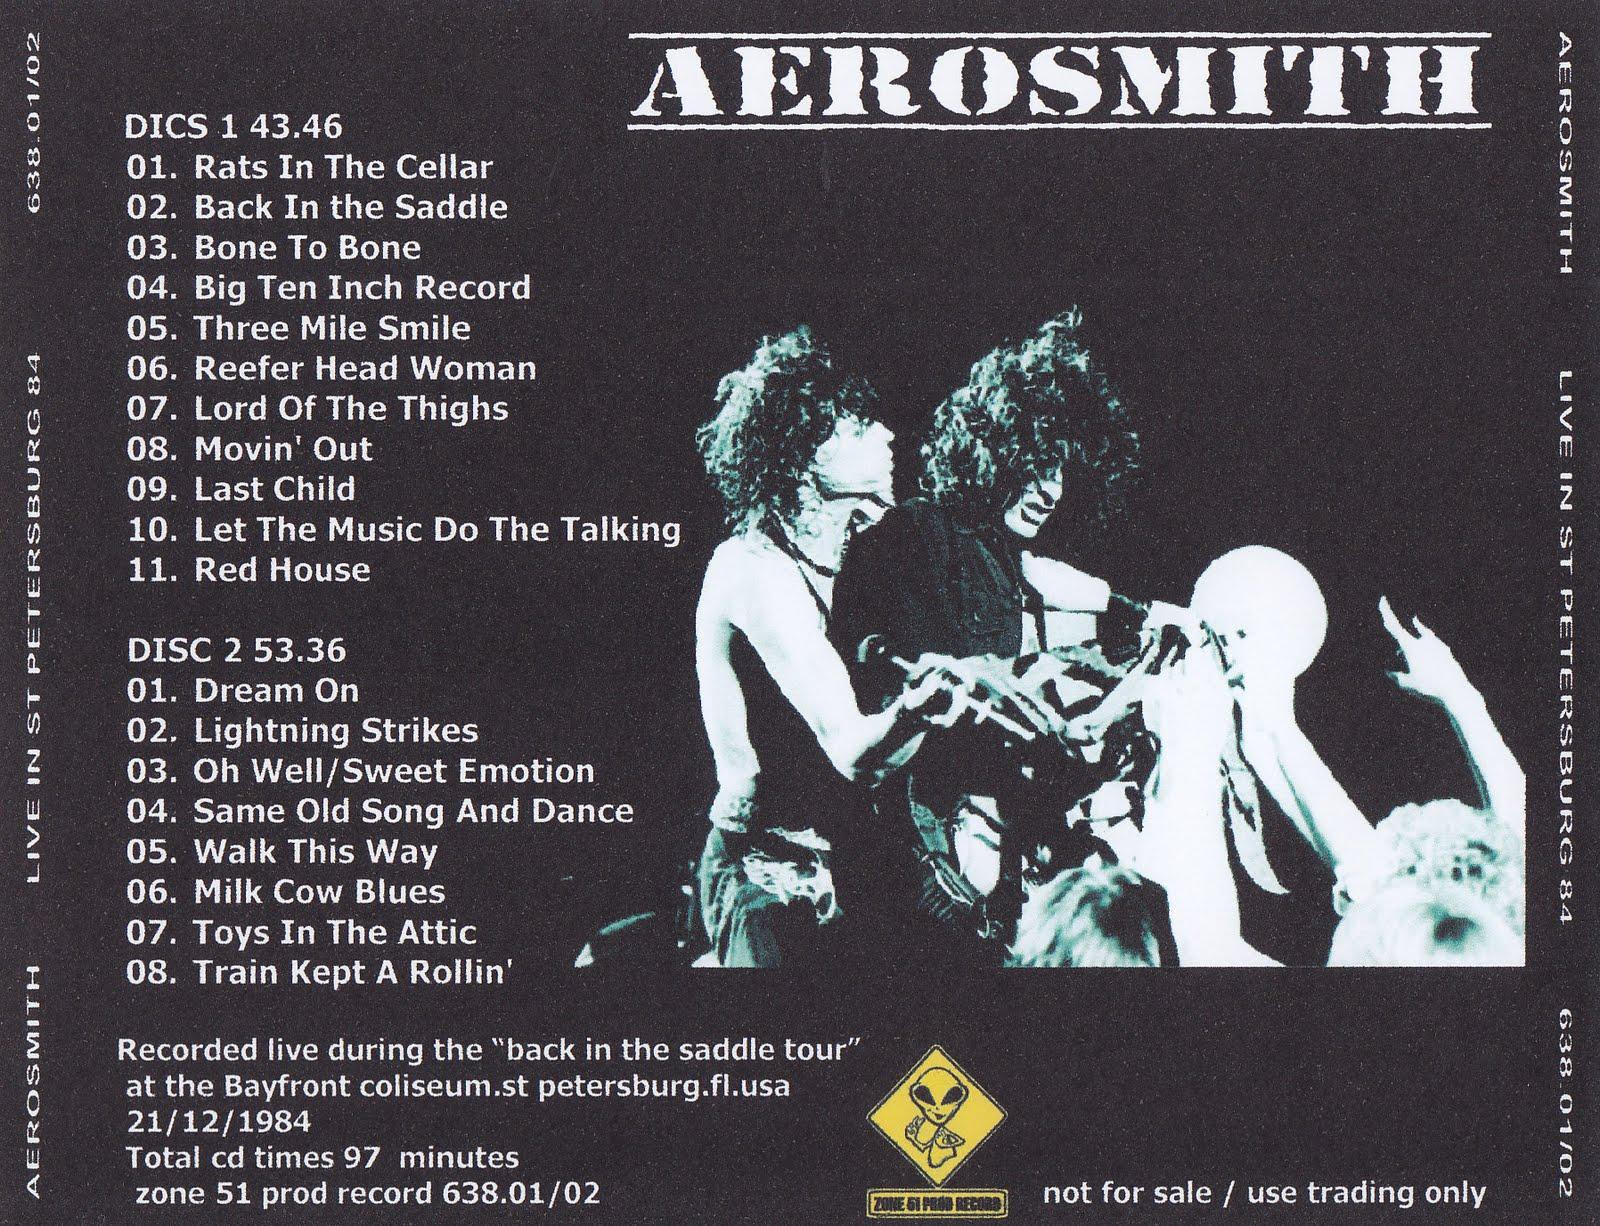 Aerosmith Bootlegs Cover Arts Live In St Petersburg 84